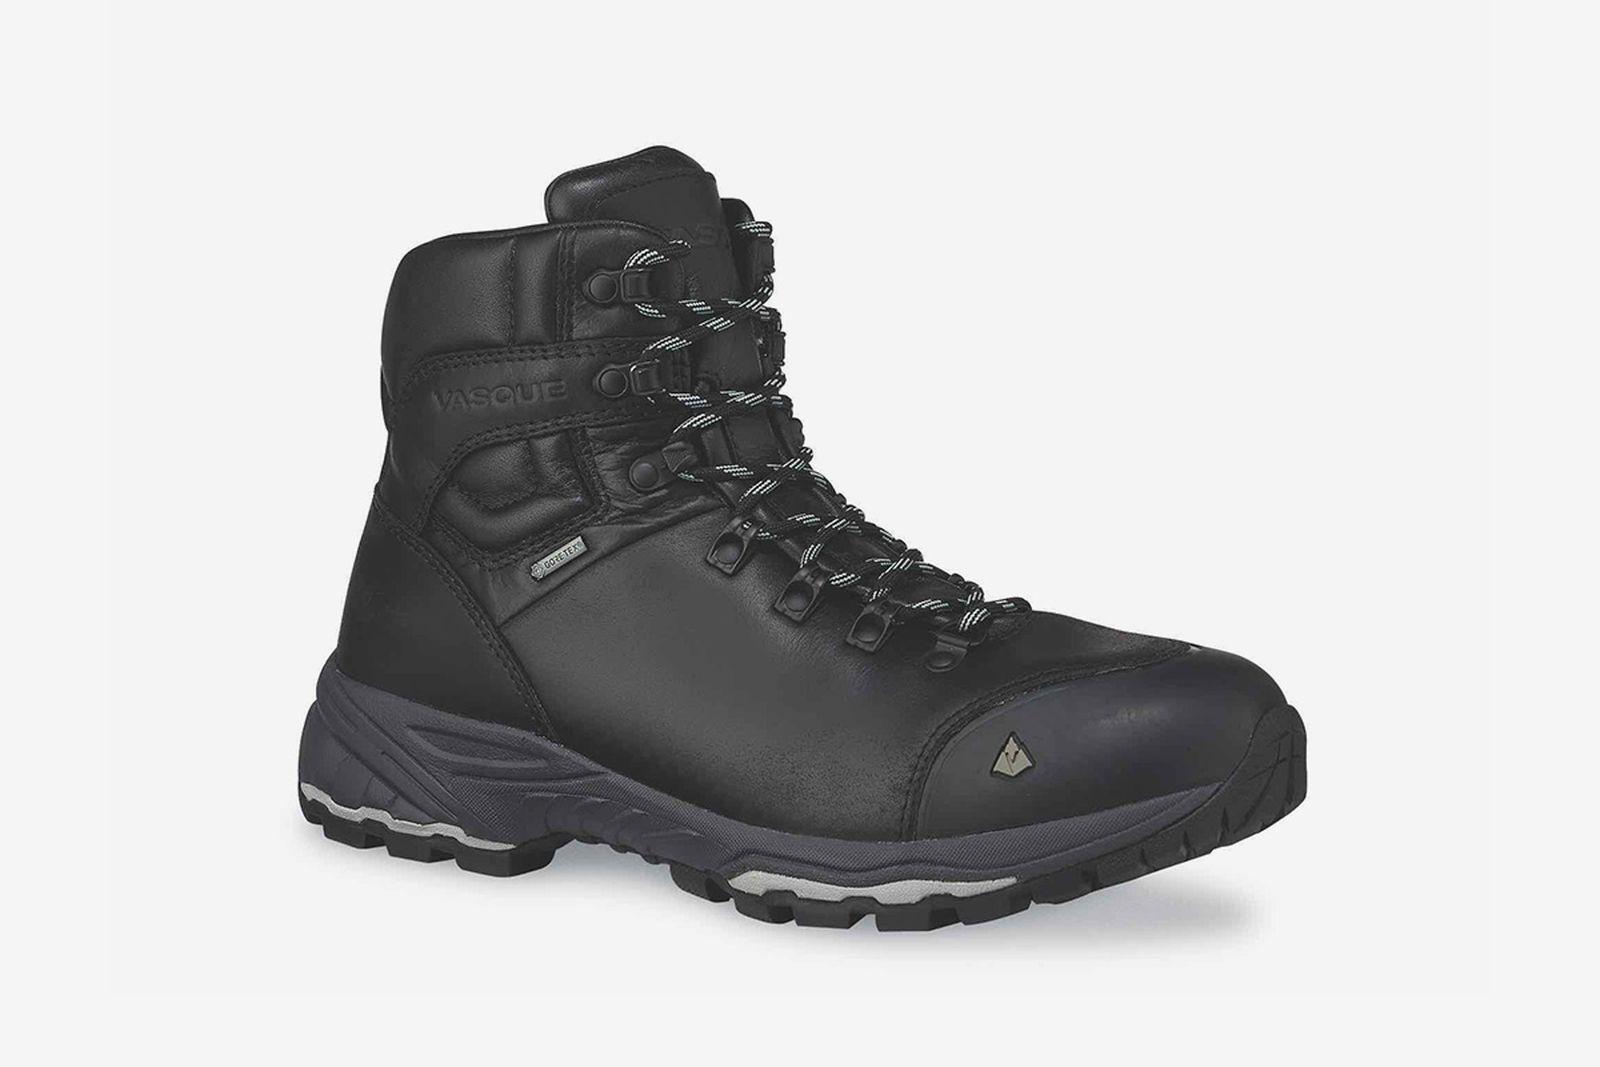 vasque st elias gore tex release date price gore-tex hiking boots